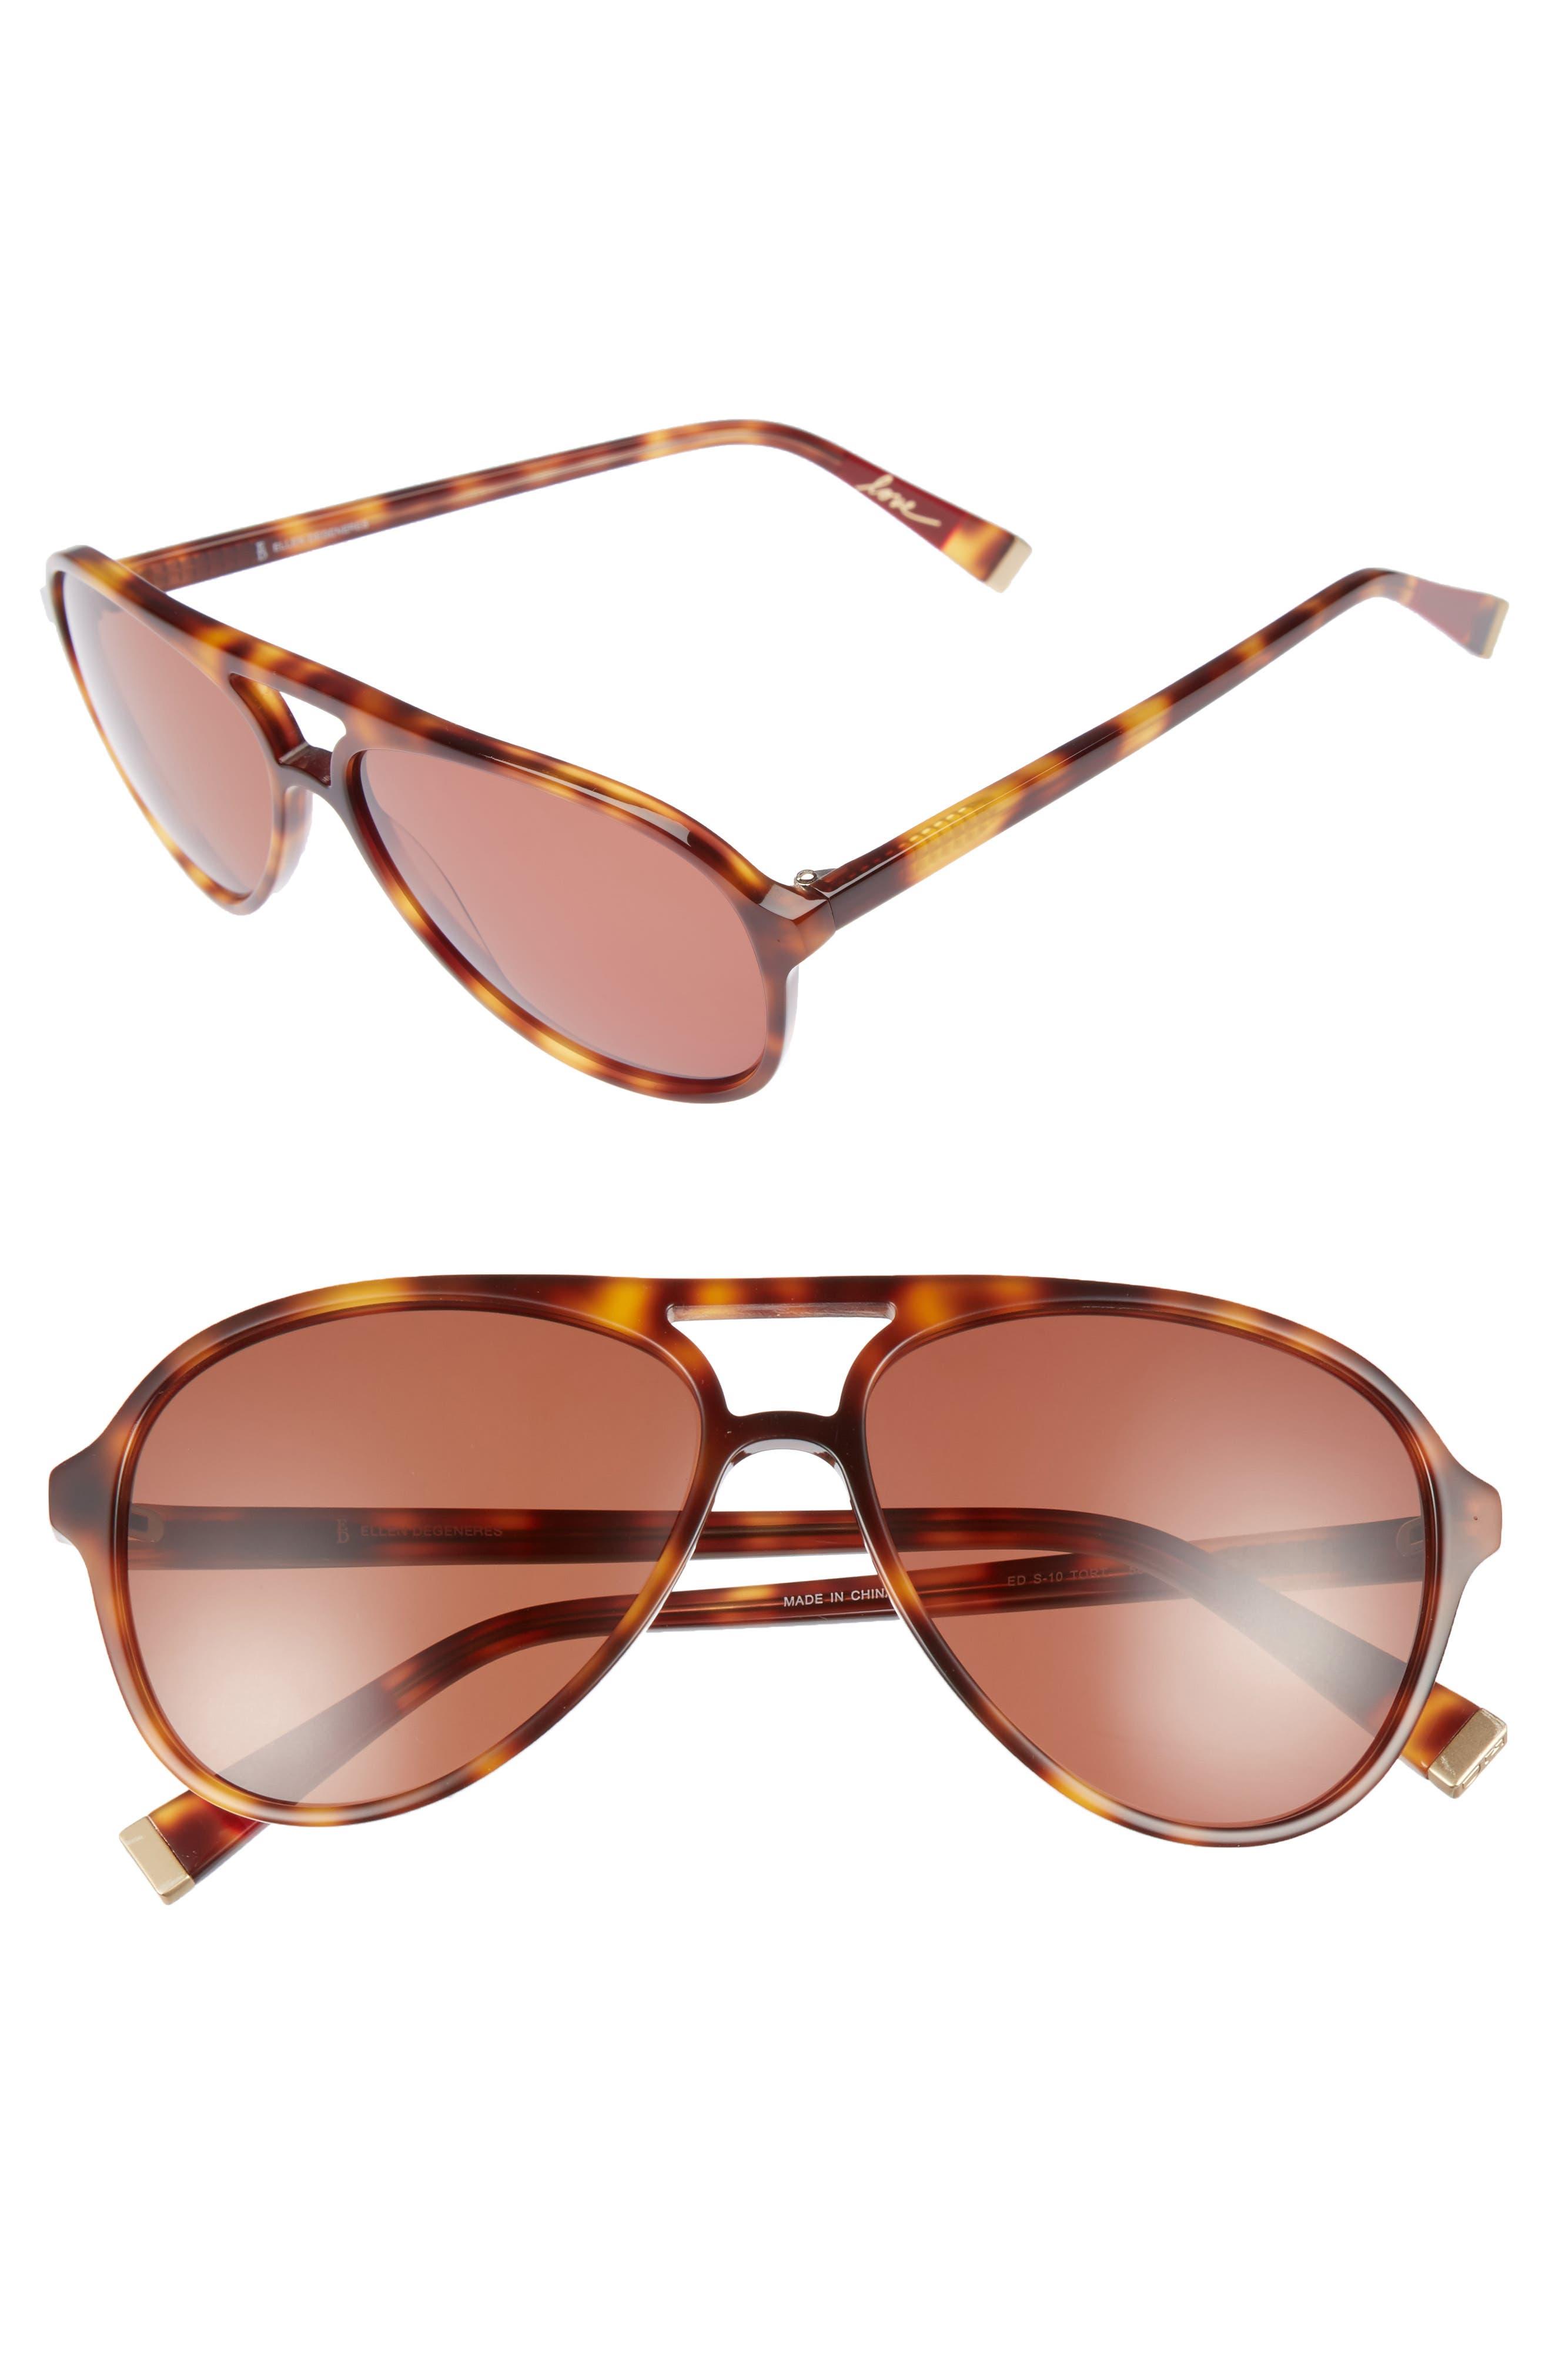 58mm Gradient Aviator Sunglasses,                             Main thumbnail 1, color,                             TORTOISE